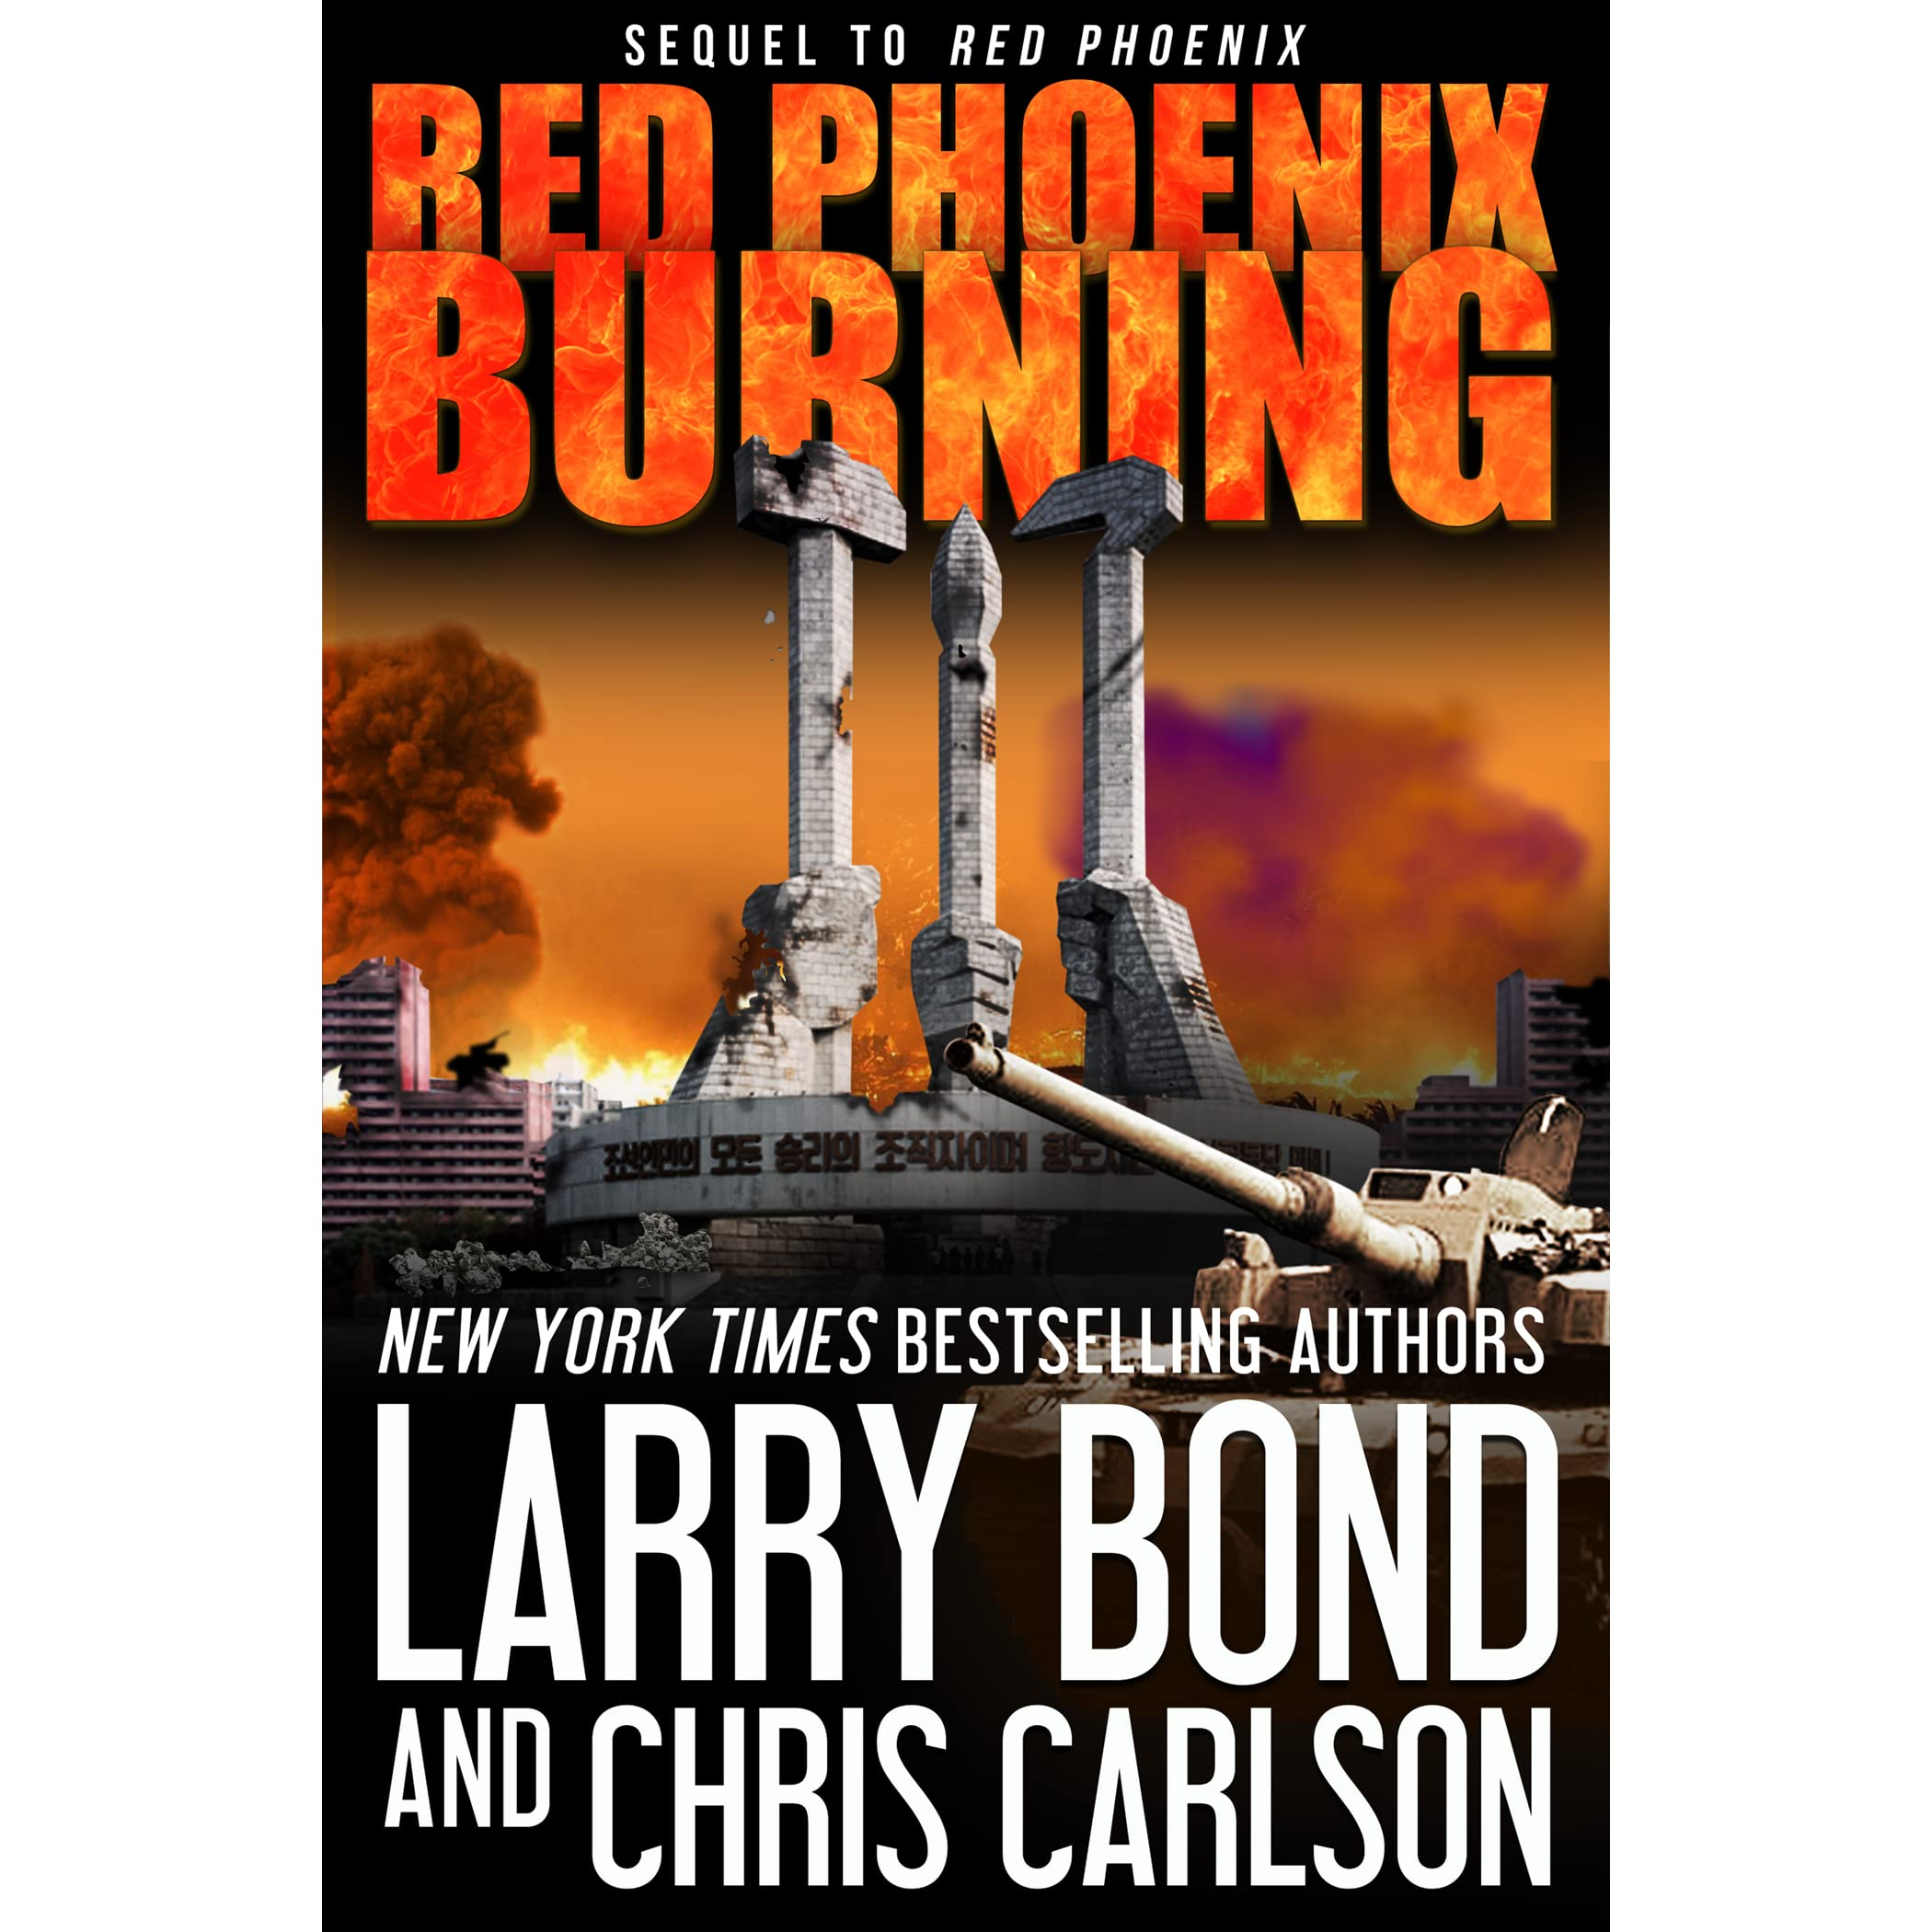 Red Phoenix Burning (Red Phoenix, #2) by Larry Bond